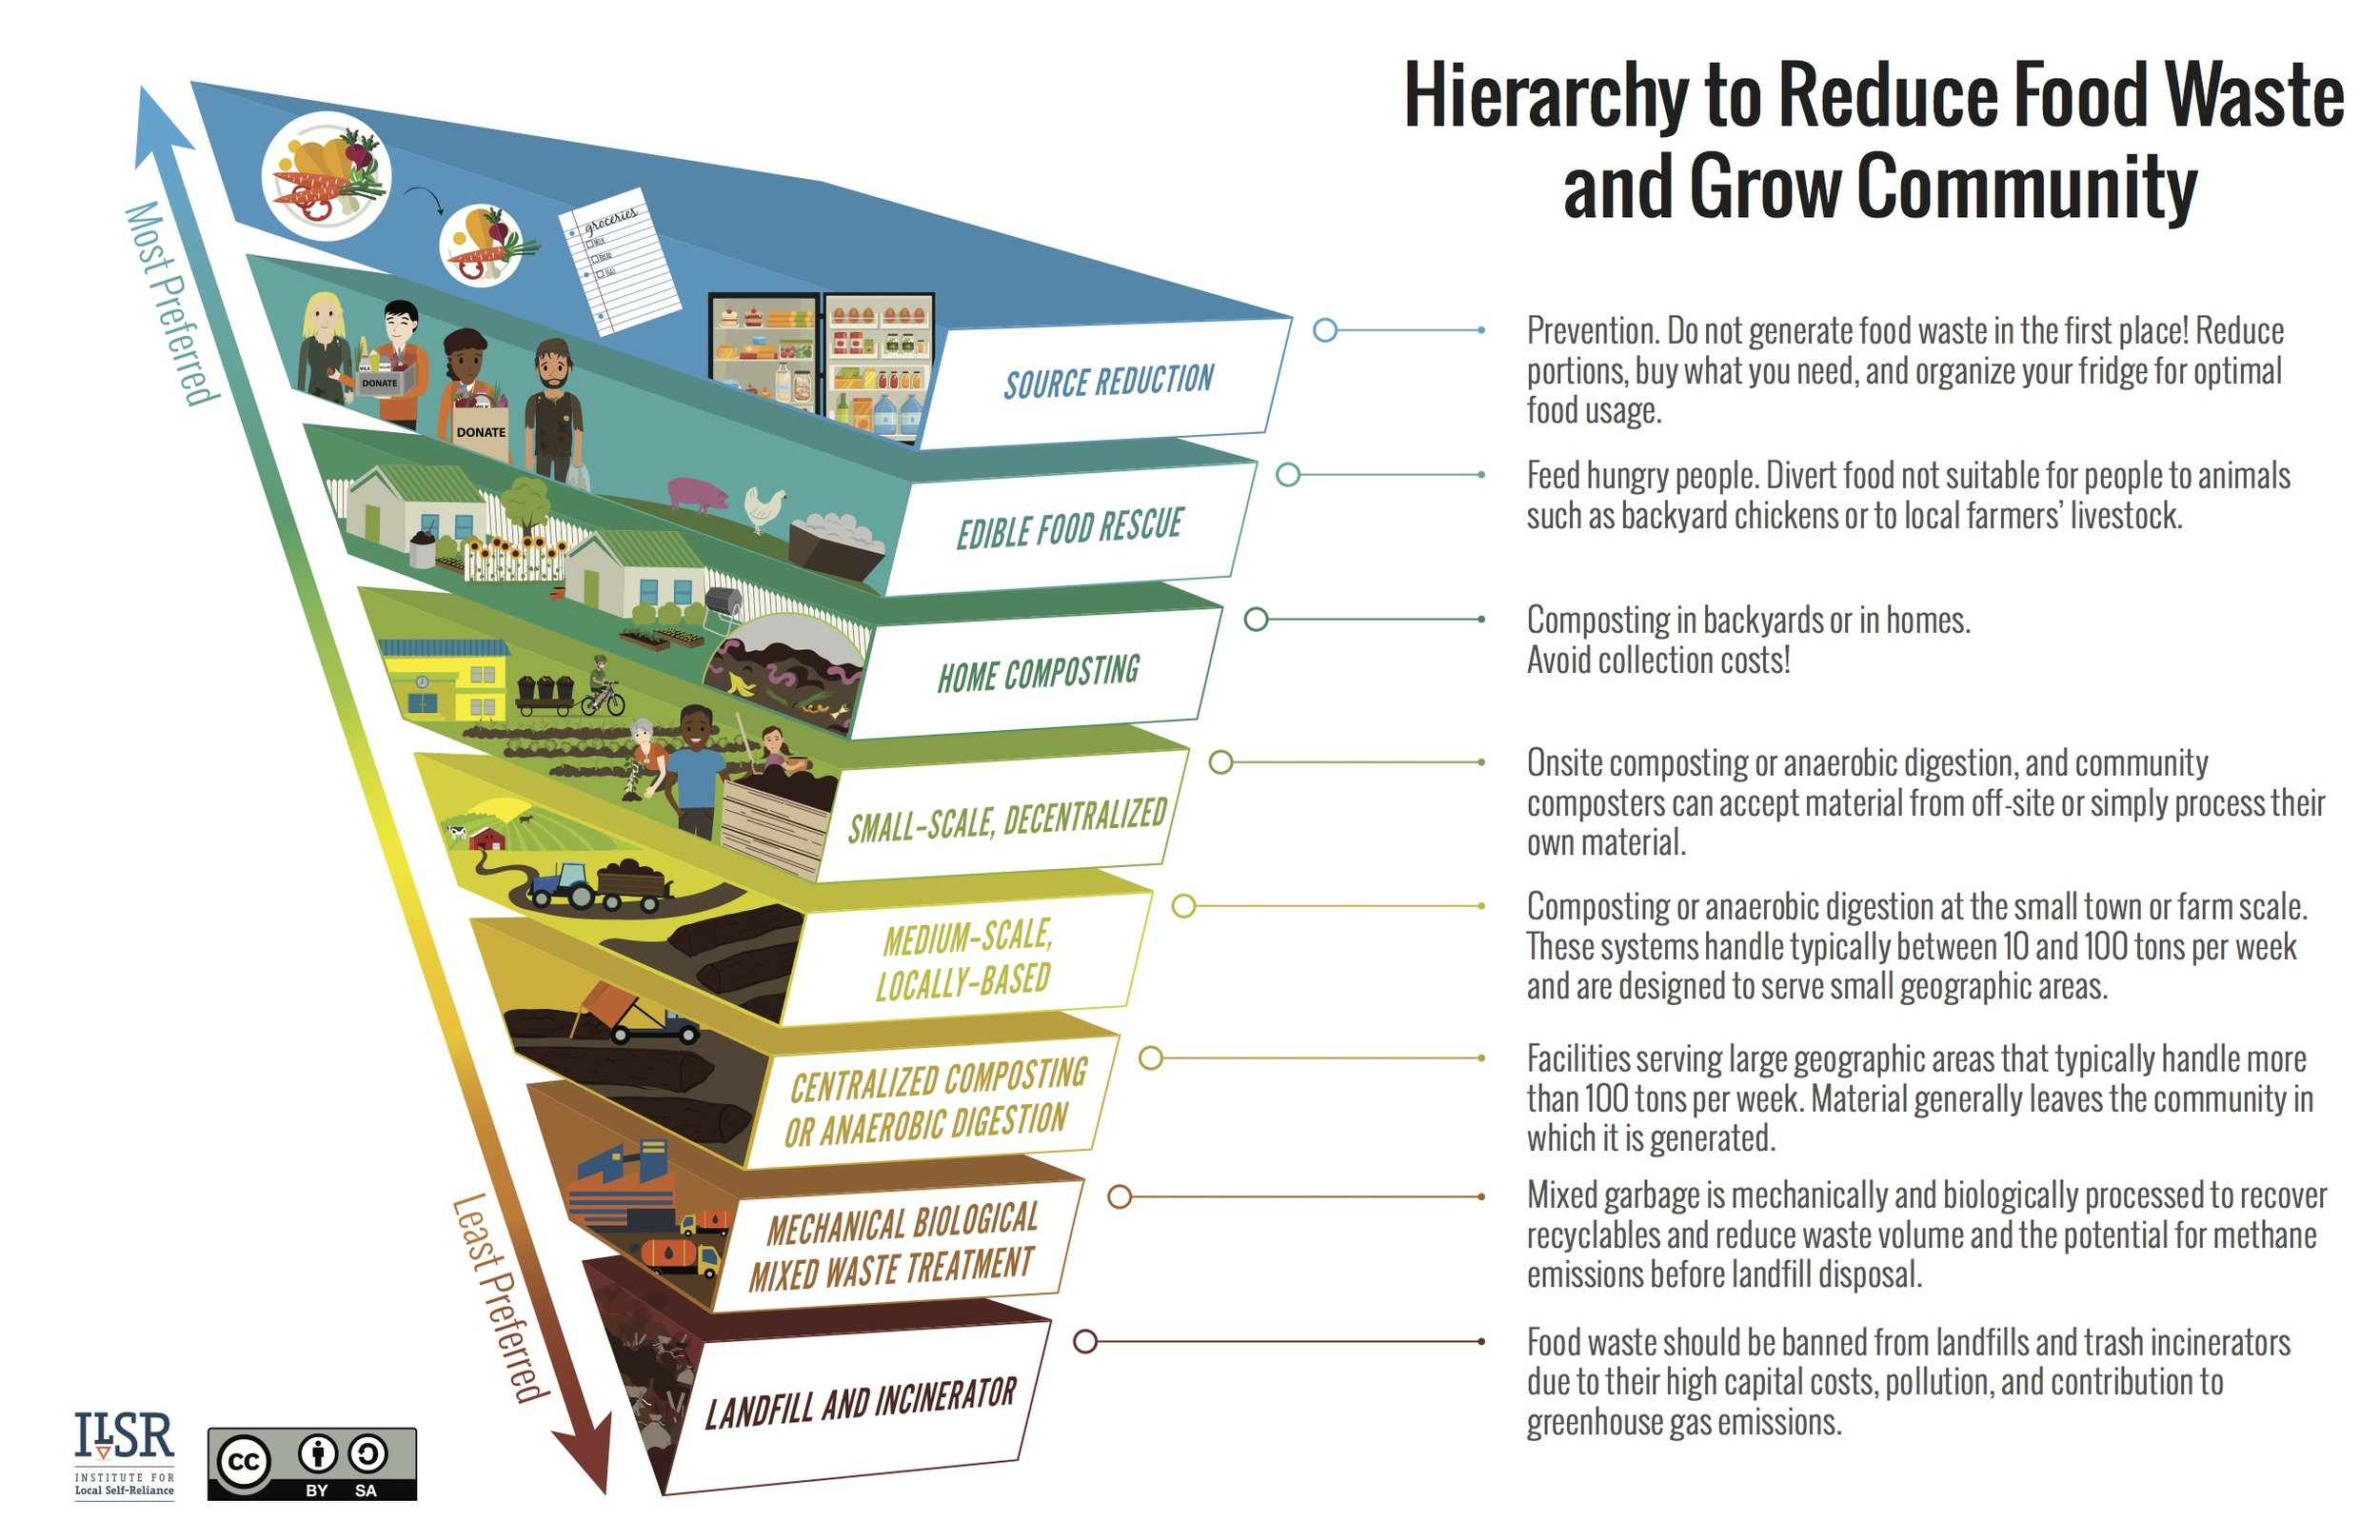 HierarchyIG-FINAL-11x17.jpg